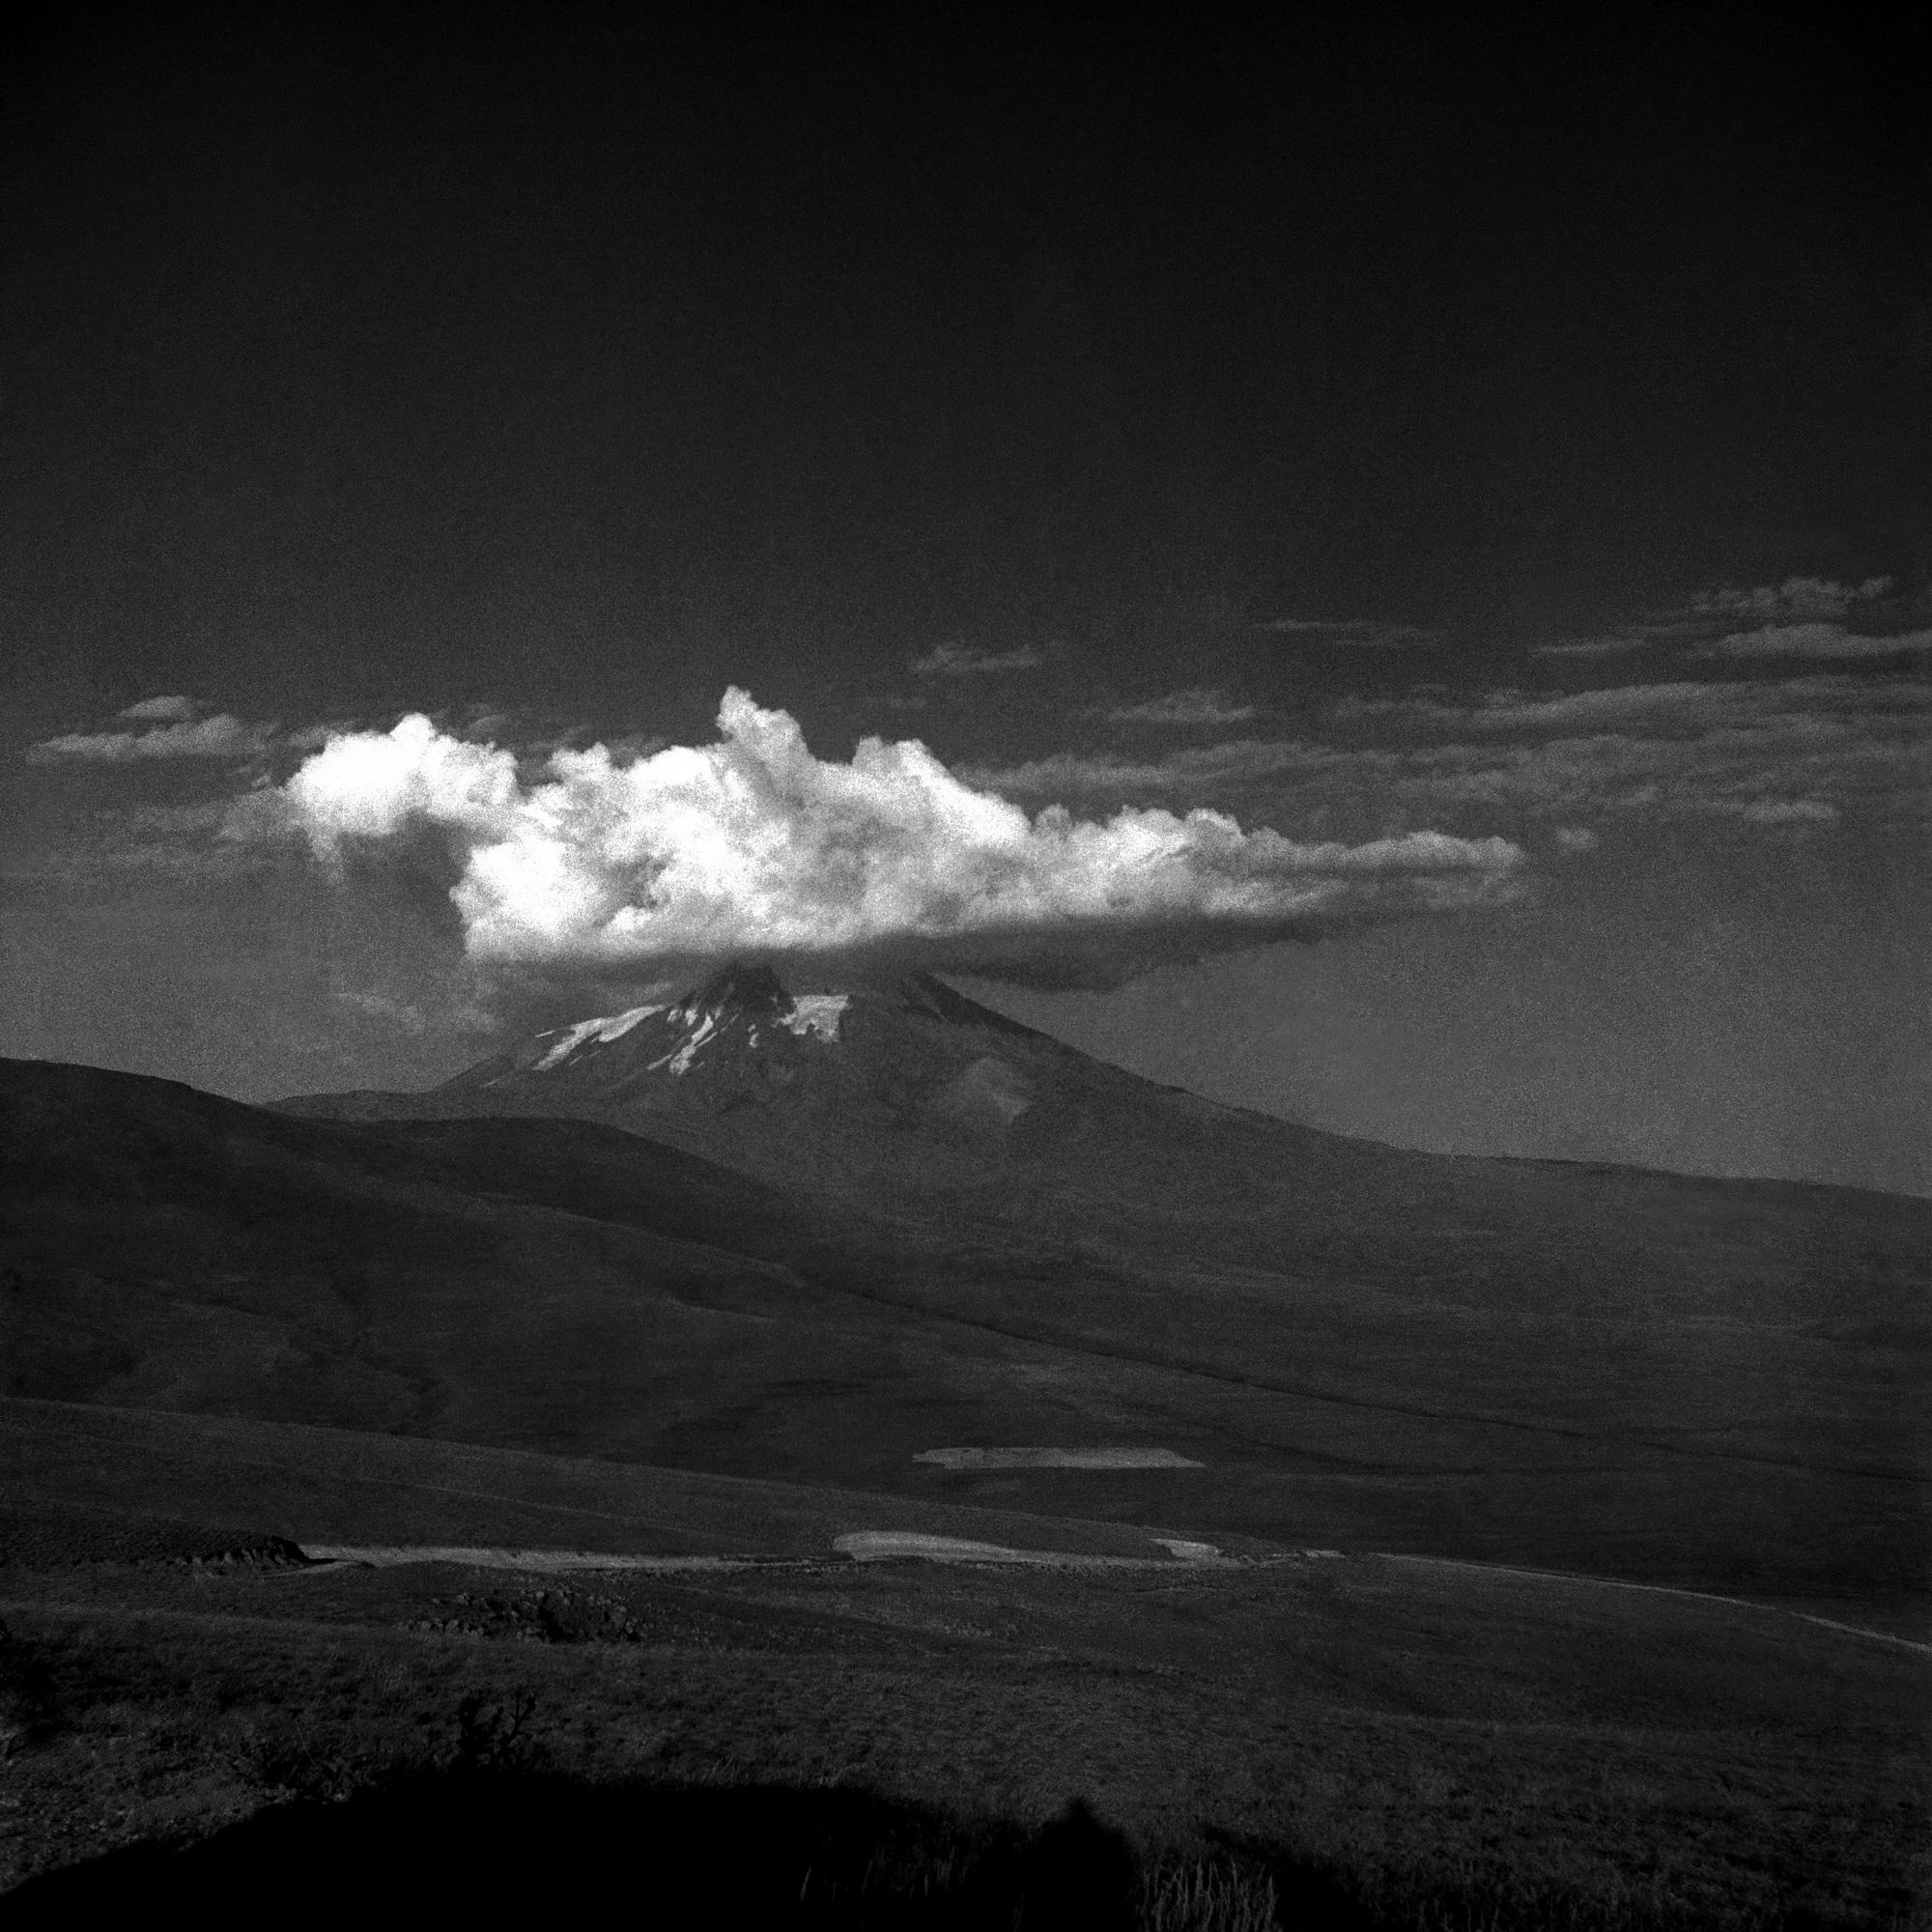 MOUNT ARARAT / AĞRI DAĞI